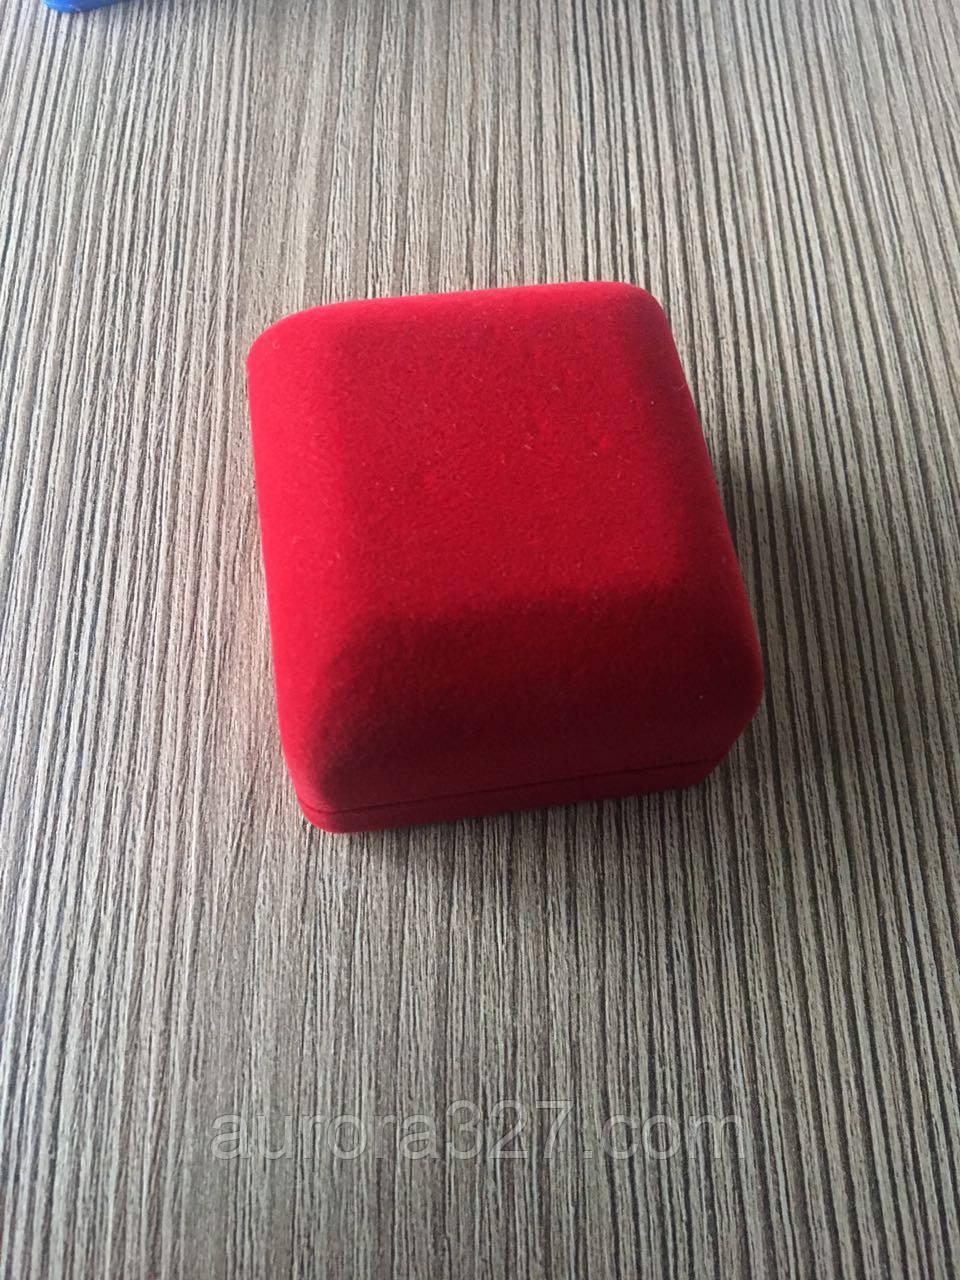 Футляр классика 3 кольцо красная